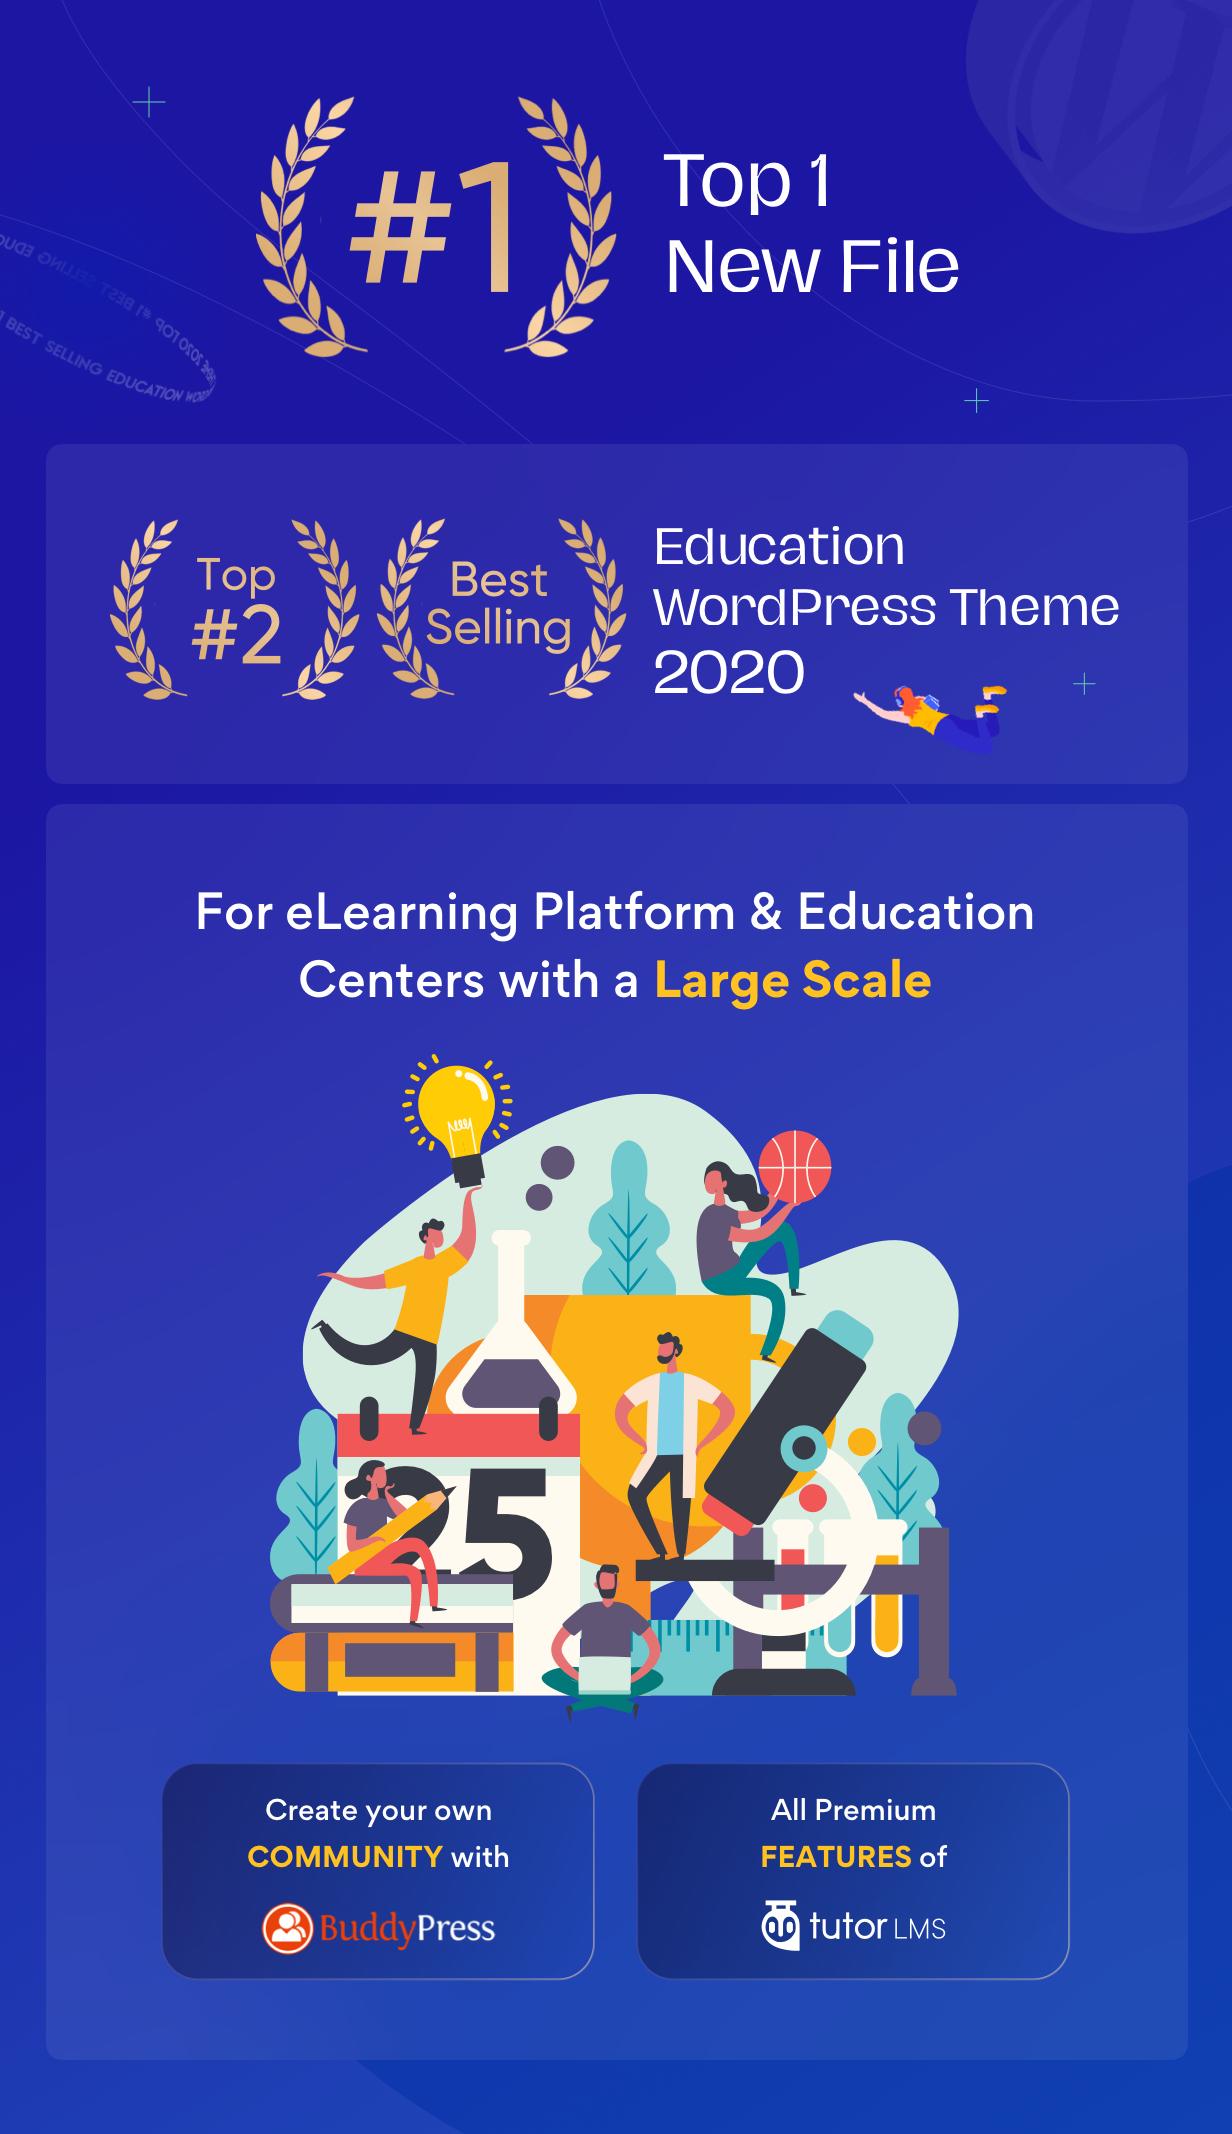 EduMall - Professional LMS Education Center WordPress Theme - 2